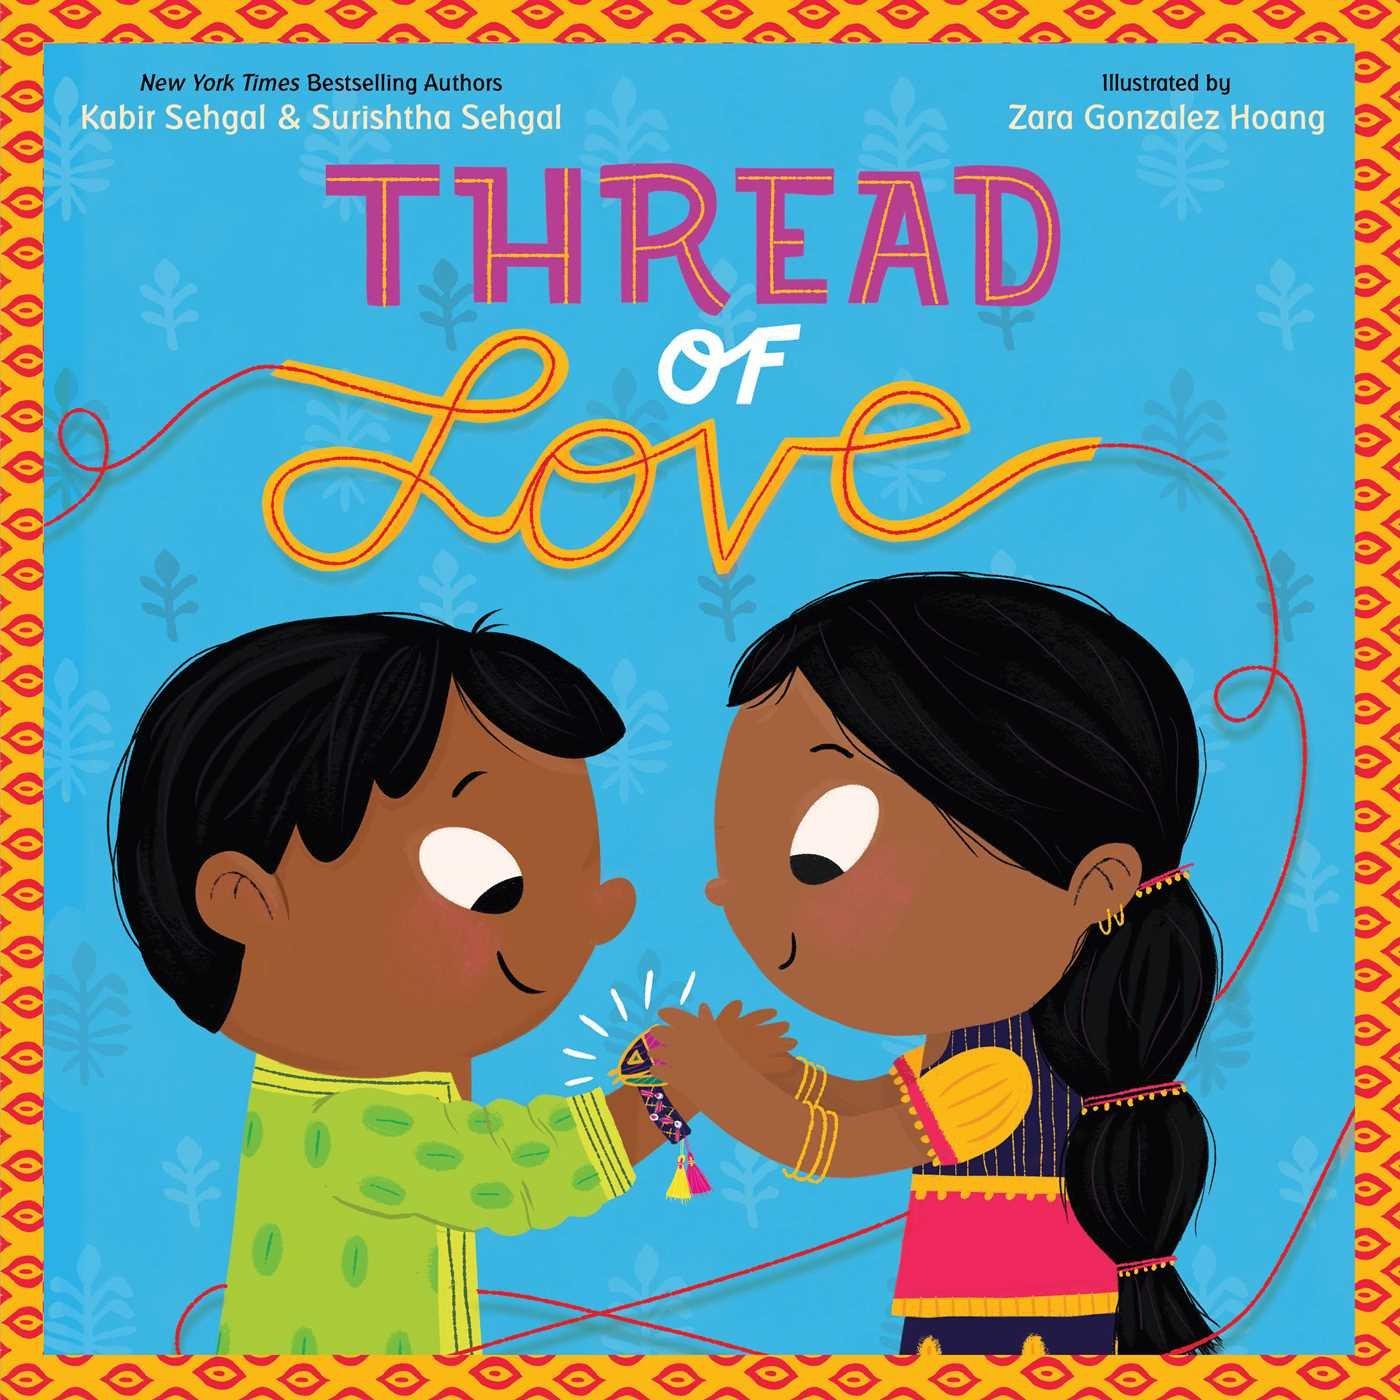 Thread of Love: Sehgal, Kabir, Sehgal, Surishtha, Hoang, Zara Gonzalez: 9781534404731: Amazon.com: Books